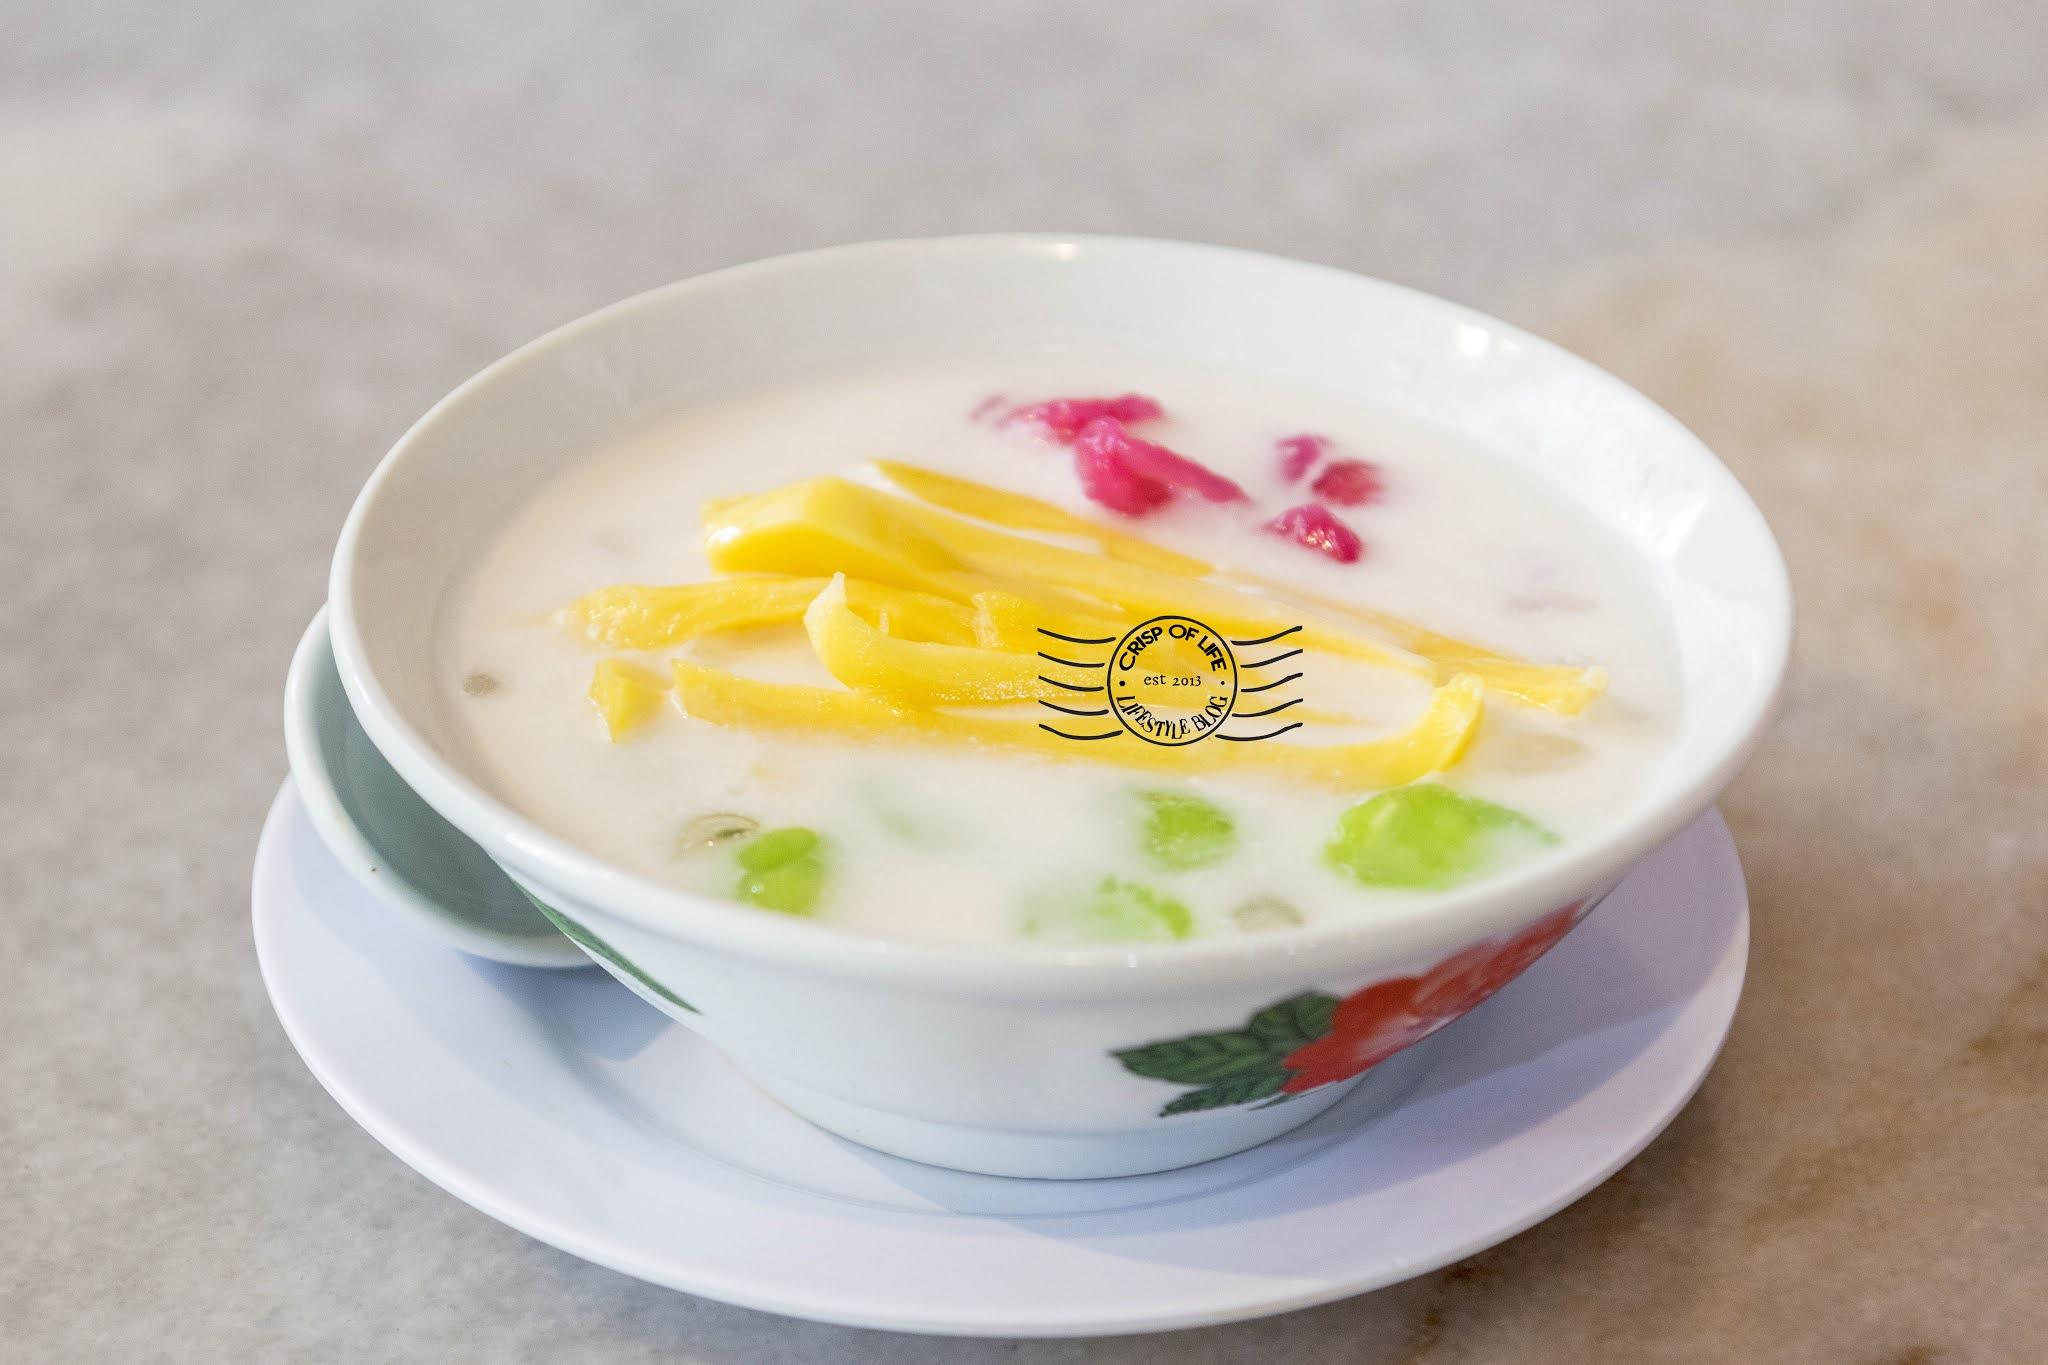 Authentic and Affordable Thai Food @ Foodie Noodles Restaurant 福有面有福, Elit Avenue Penang